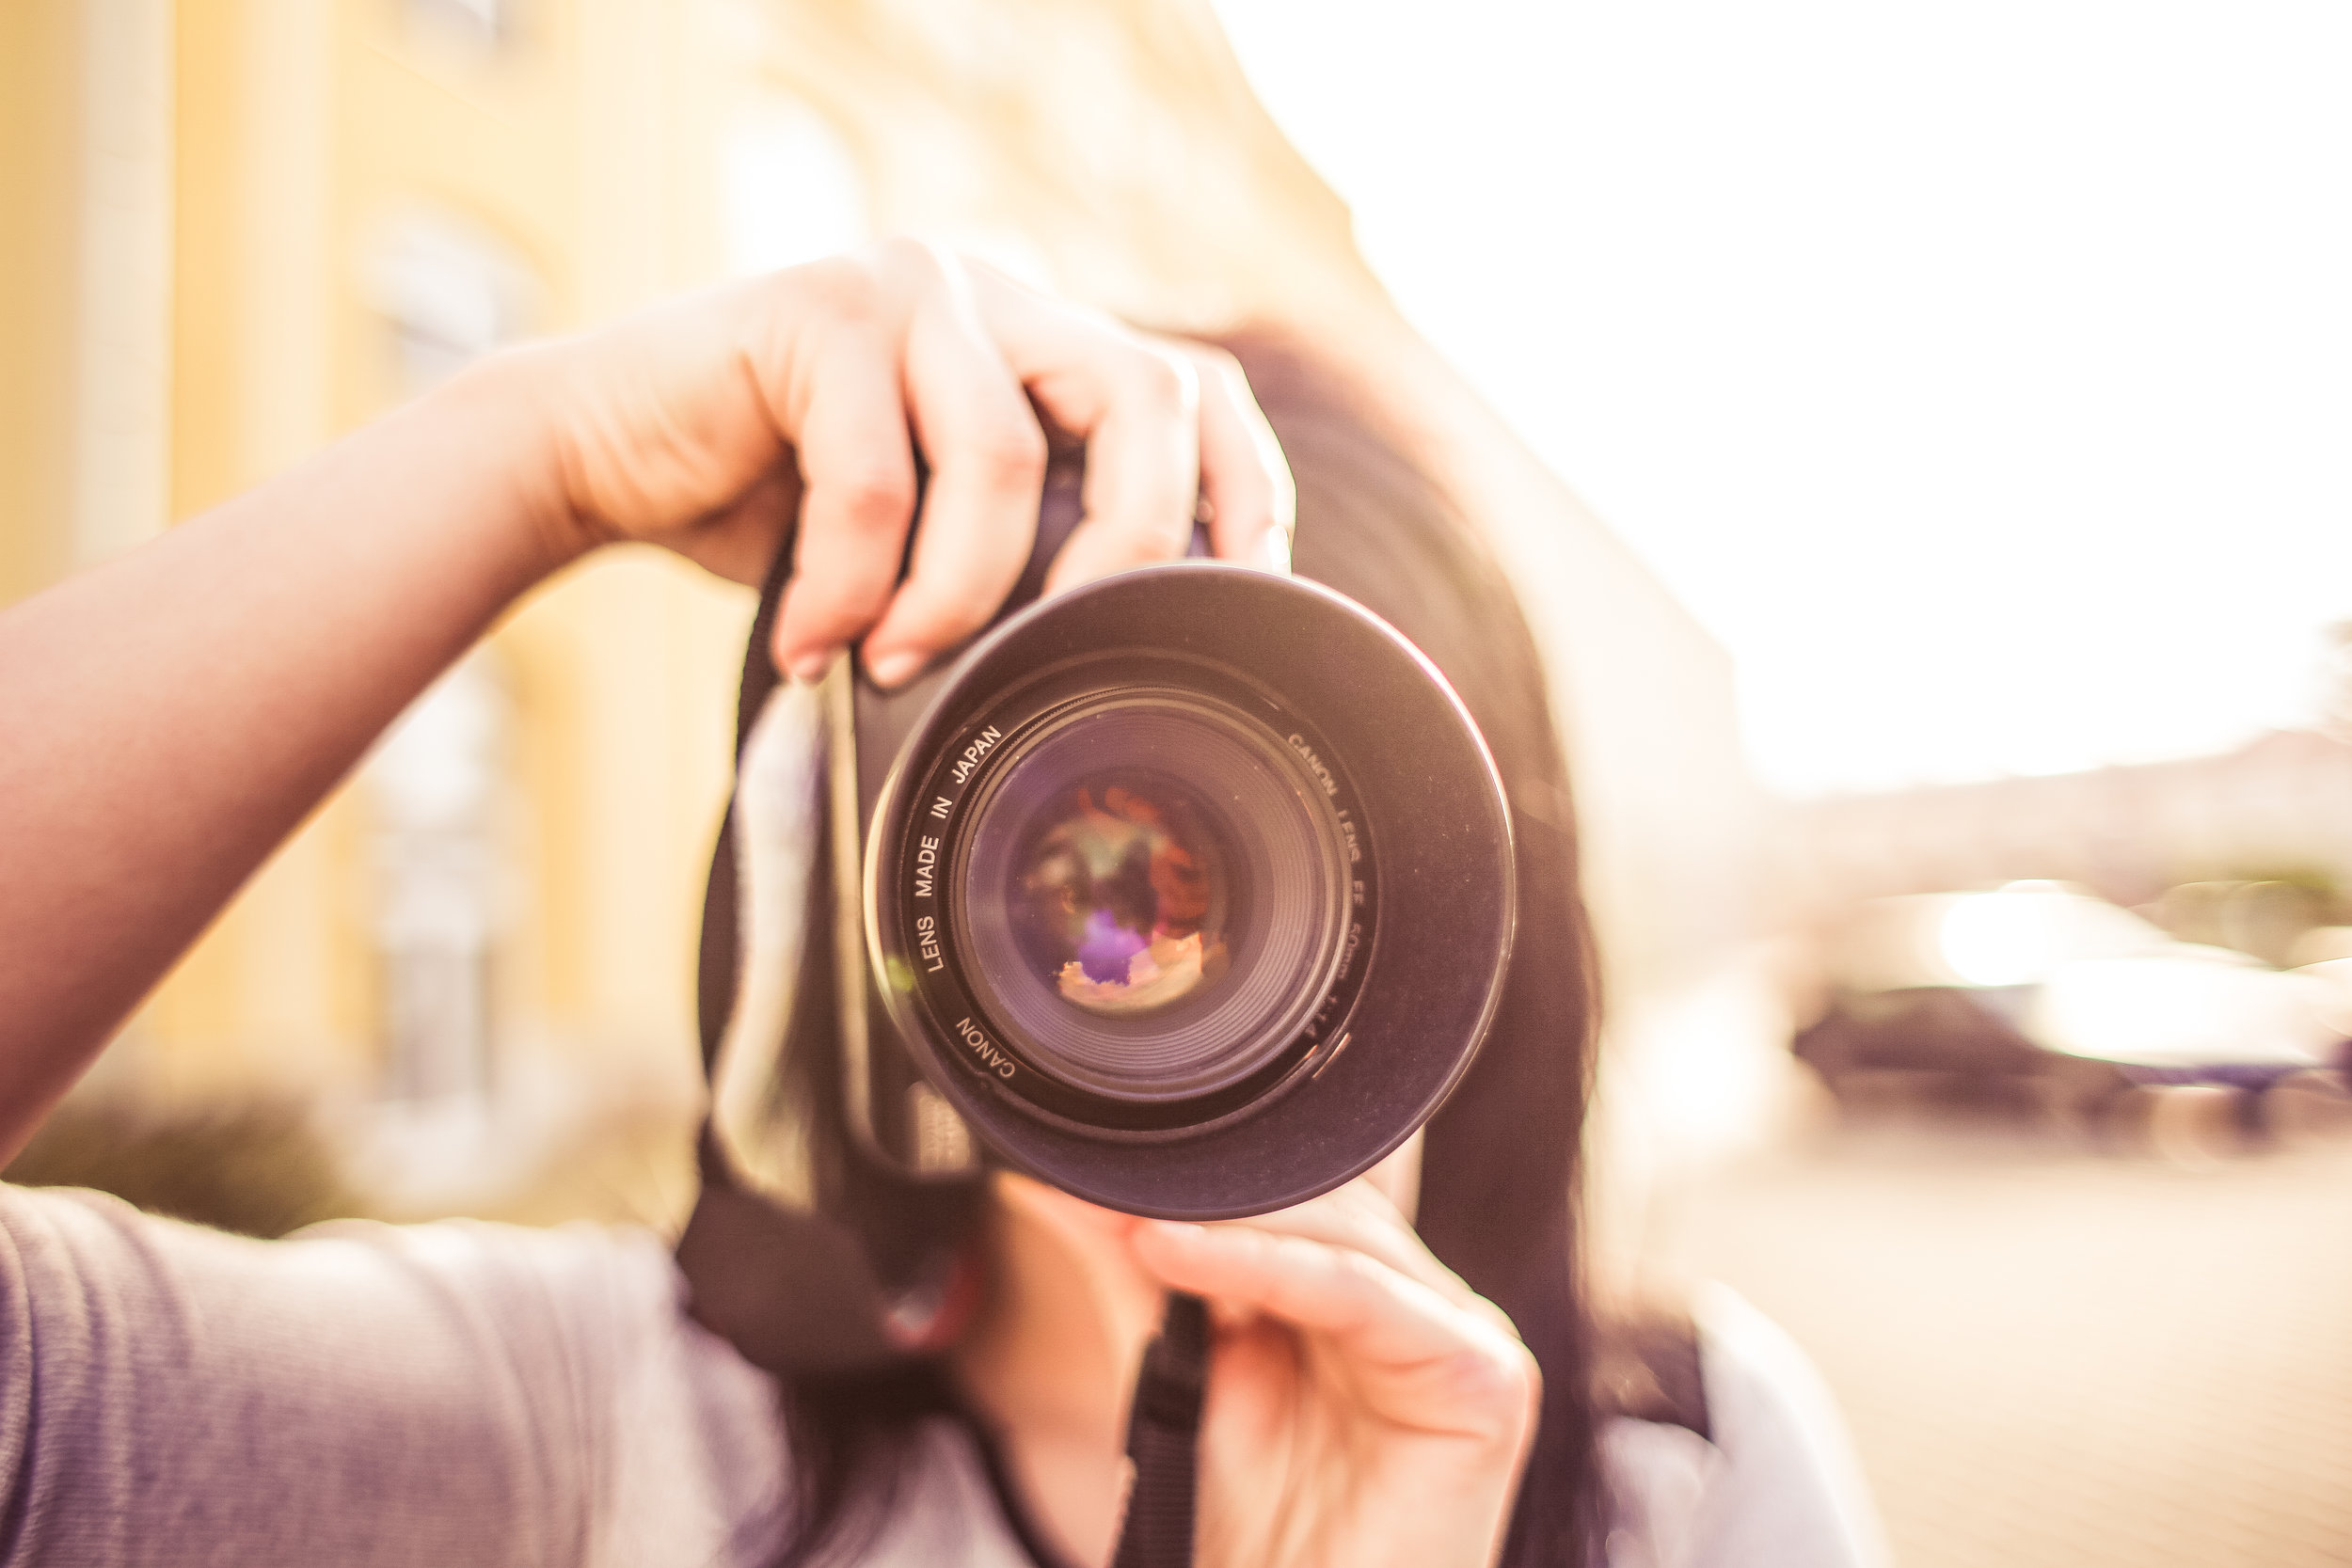 girl-shooting-with-dsrl-in-sun-picjumbo-com.jpg